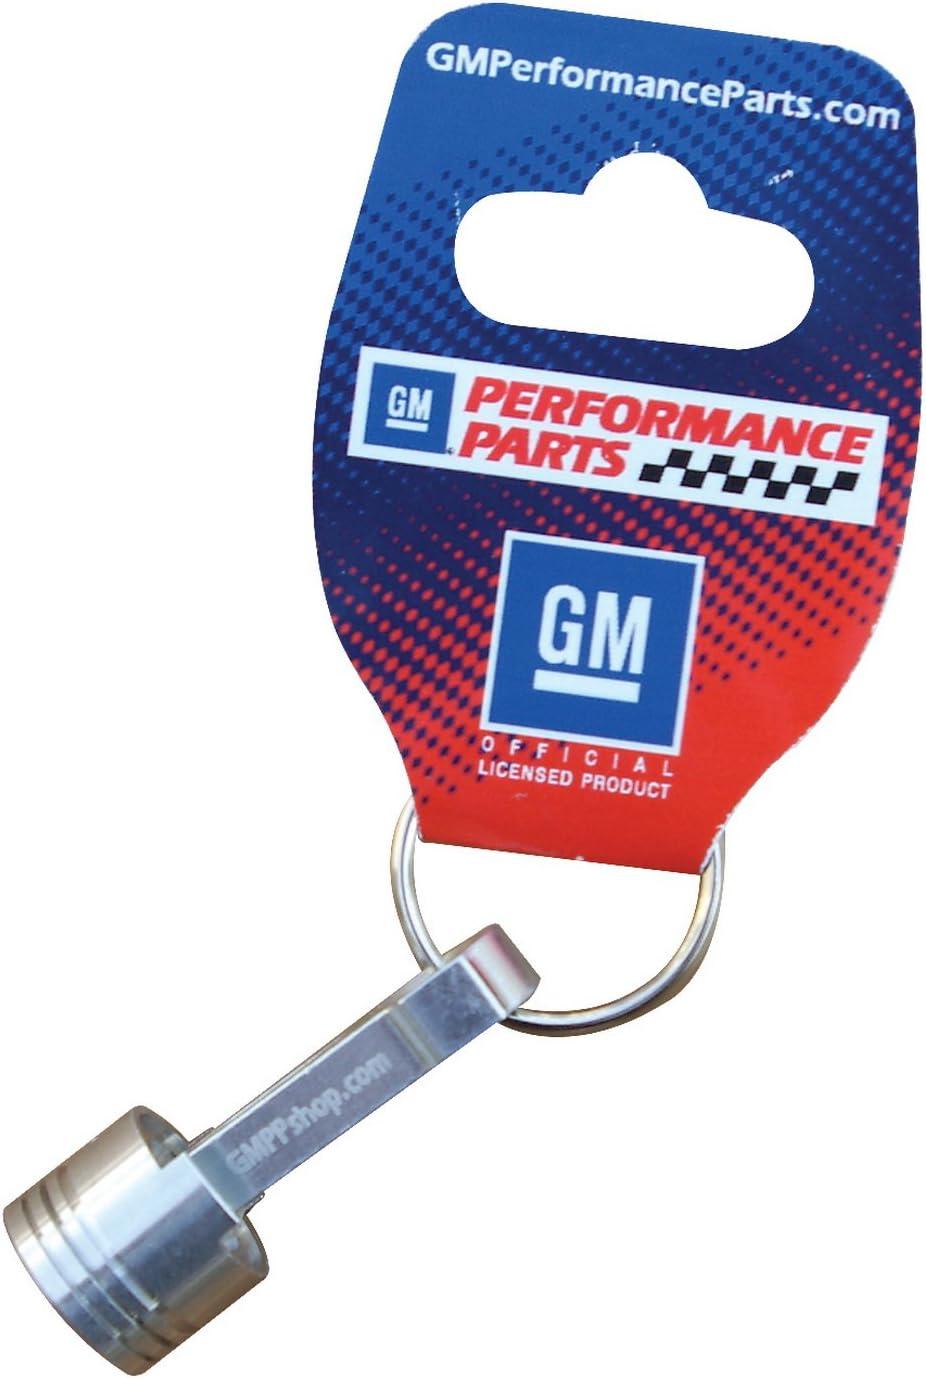 141-970 Proform 141-970 GM Performance Parts Piston Rod Keychain